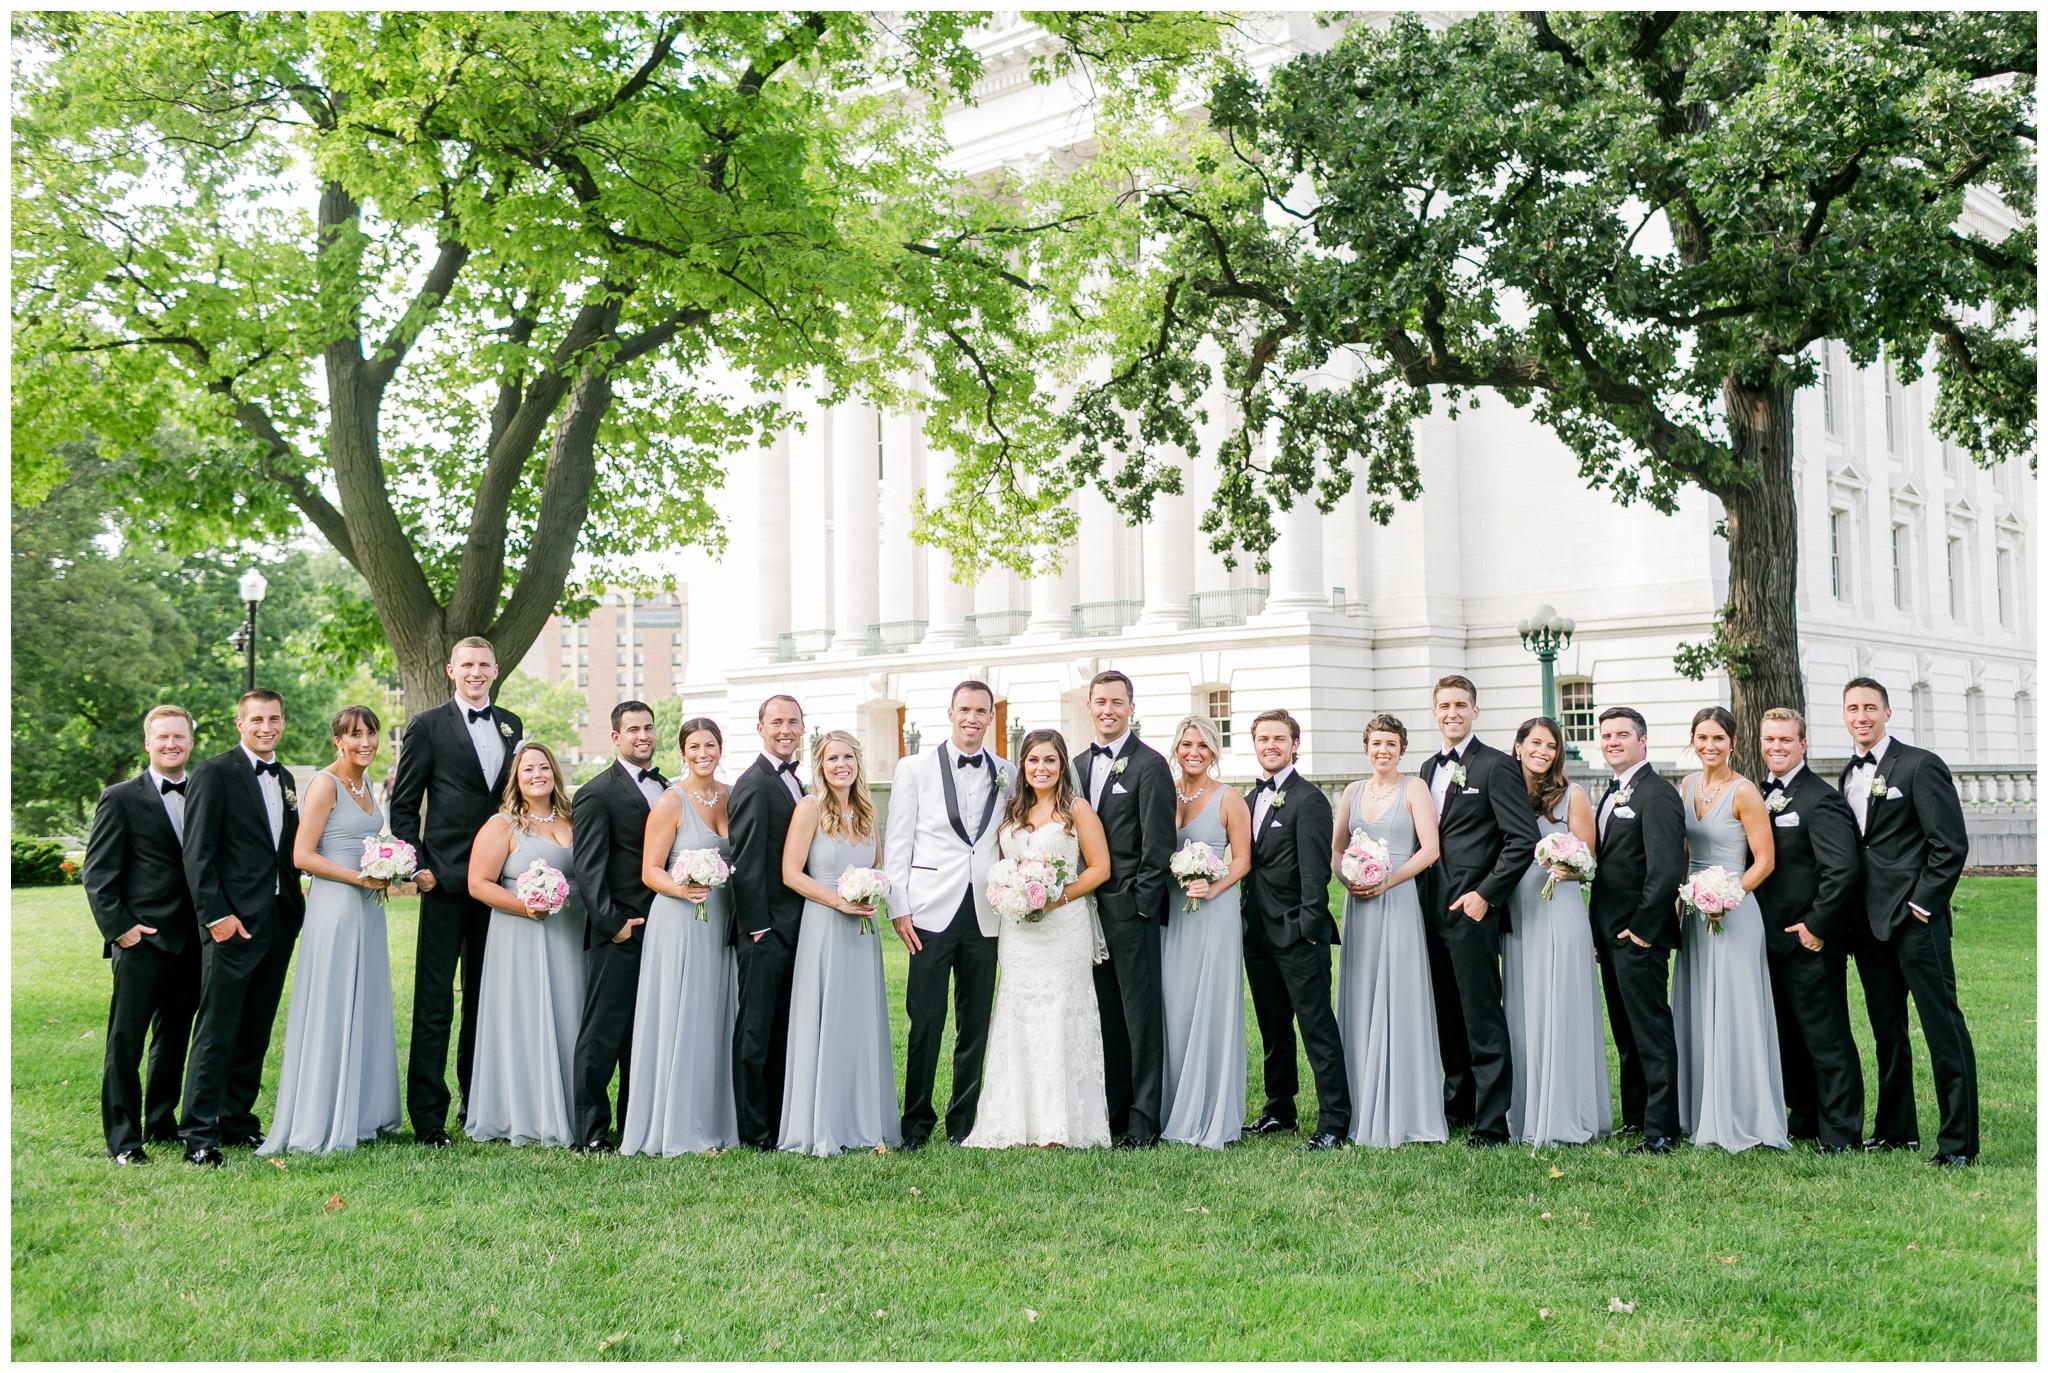 UW_Memorial_Union_wedding_madison_wisconsin_wedding_photographers_4613.jpg